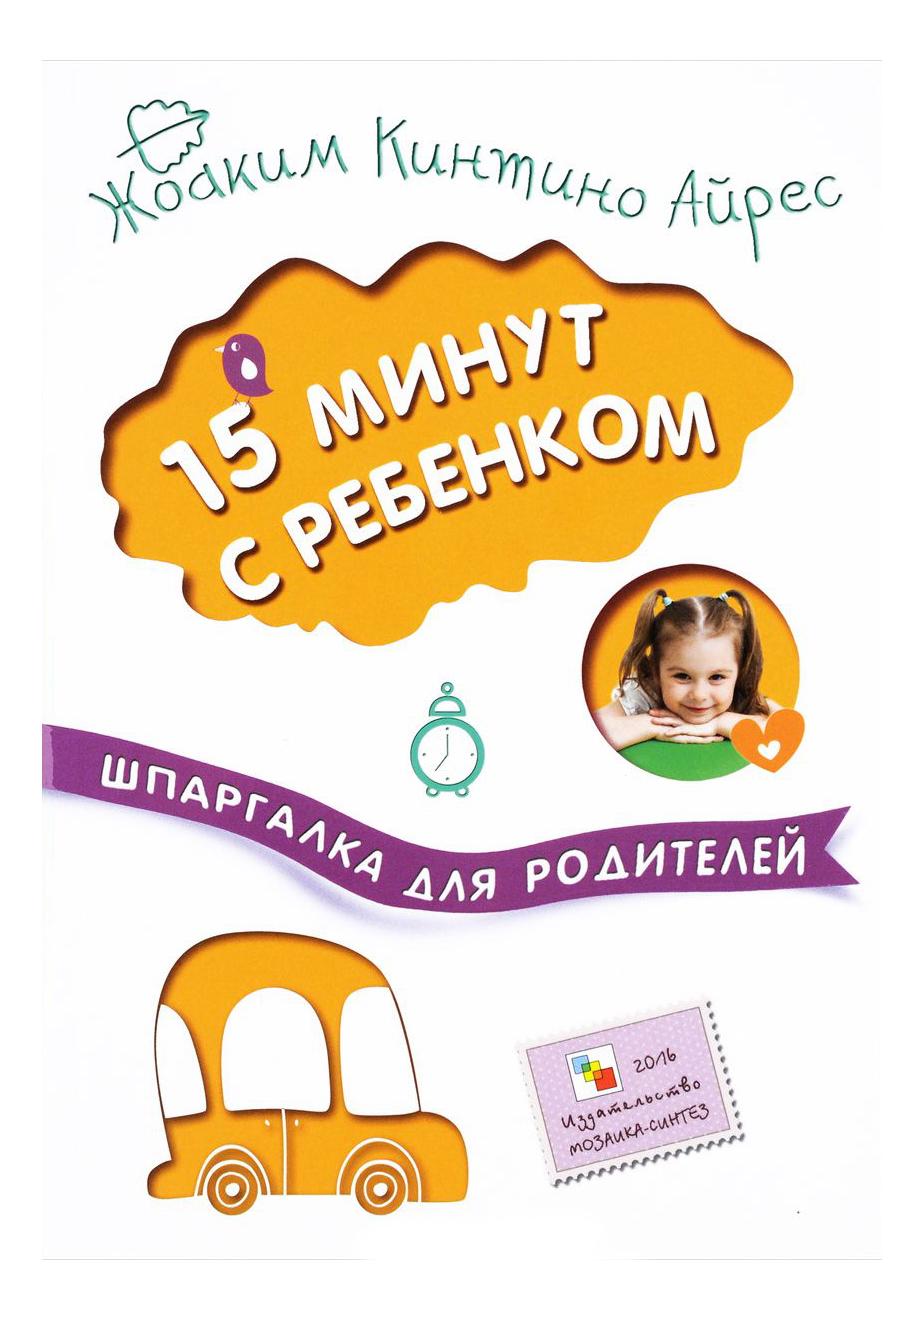 Книжка Мозаика-Синтез Шпаргалка для Родителей 15 Минут С Ребенком, Ж. к. Айрес фото